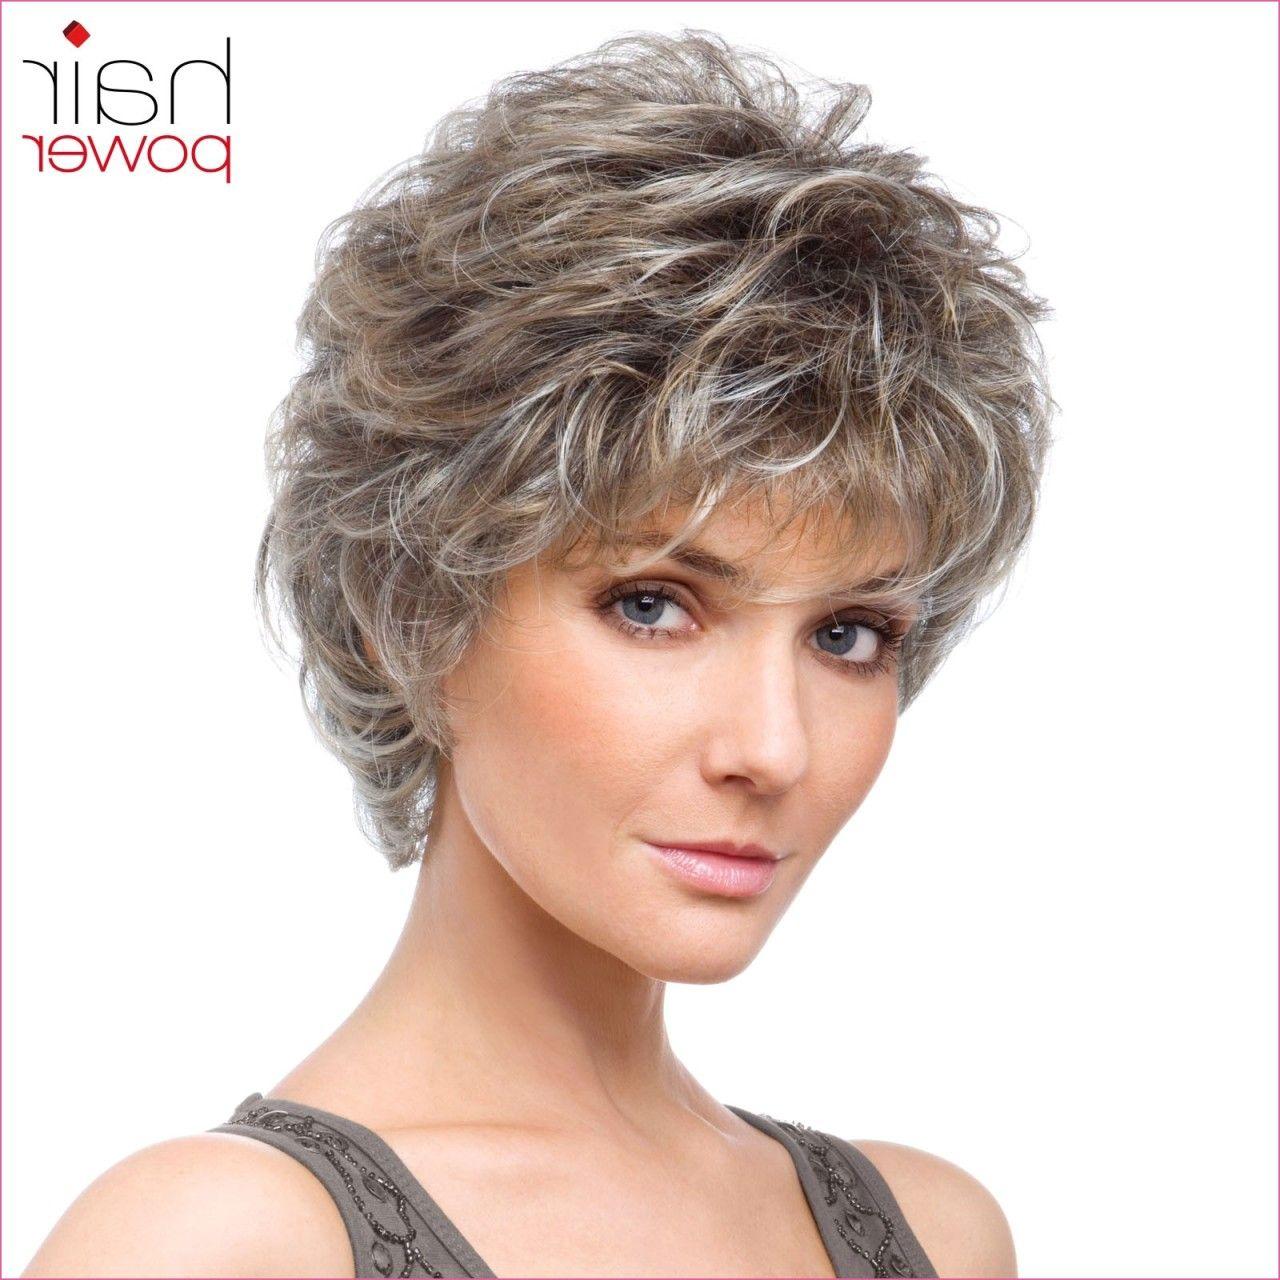 Fresh Frisuren Graue Haare Locken Short Hair Styles Easy Hair Styles Womens Hairstyles